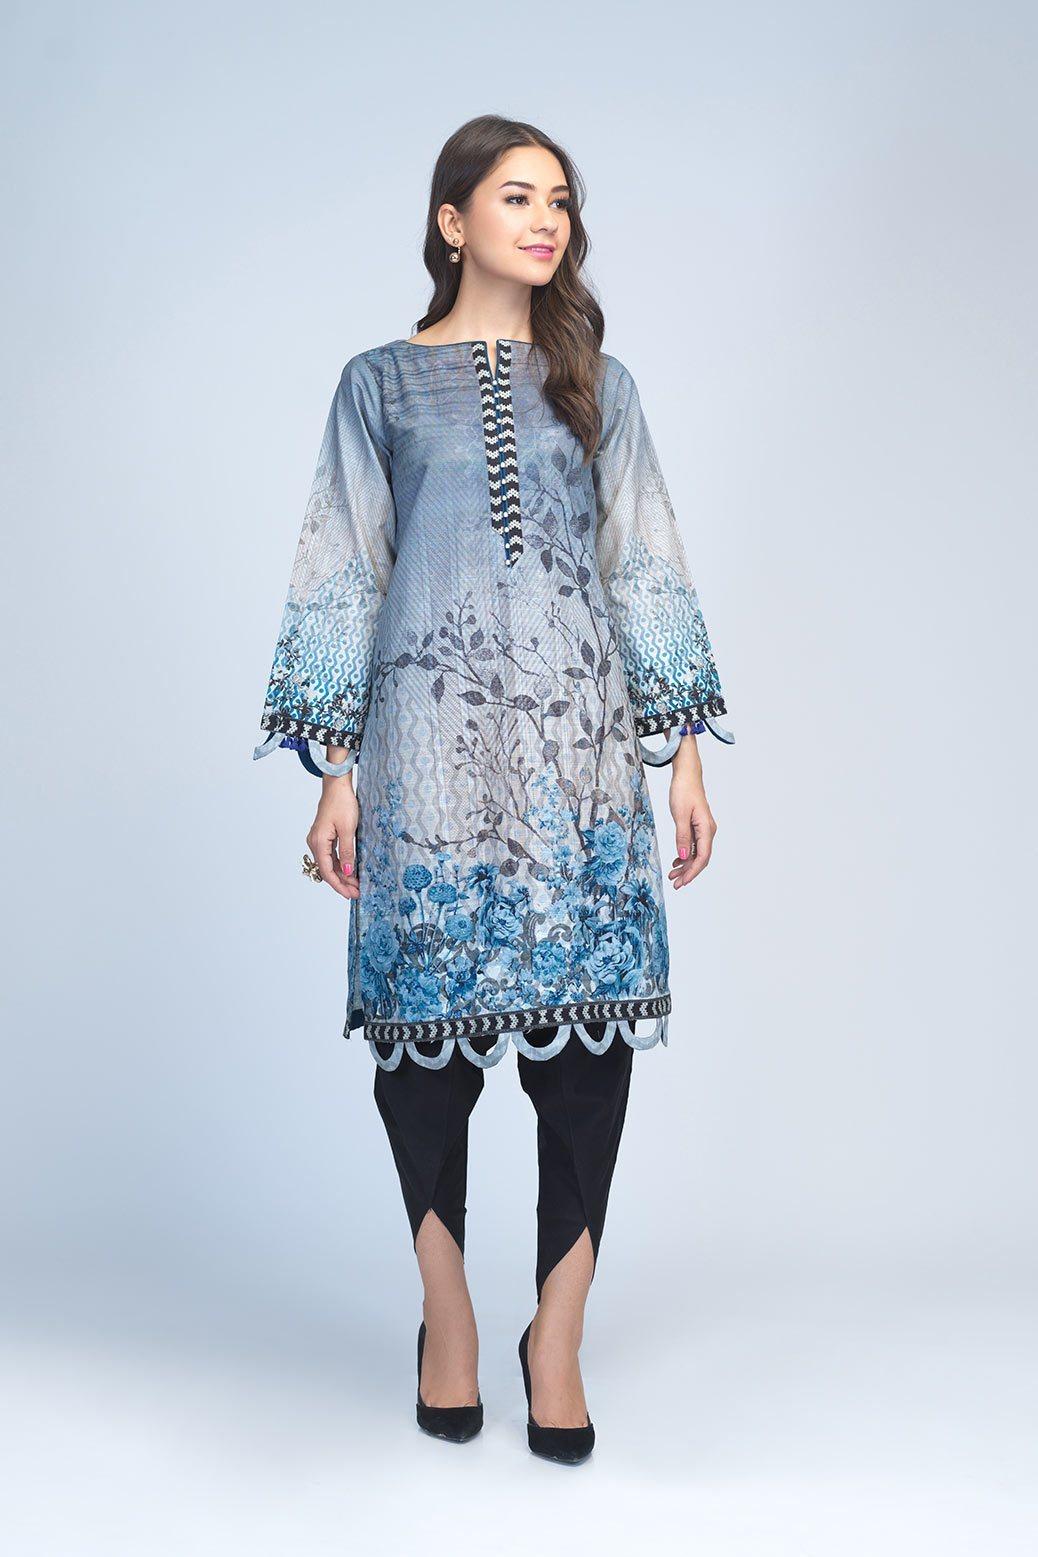 Bonanza Satrangi Unstitched winter Light Blue color dress